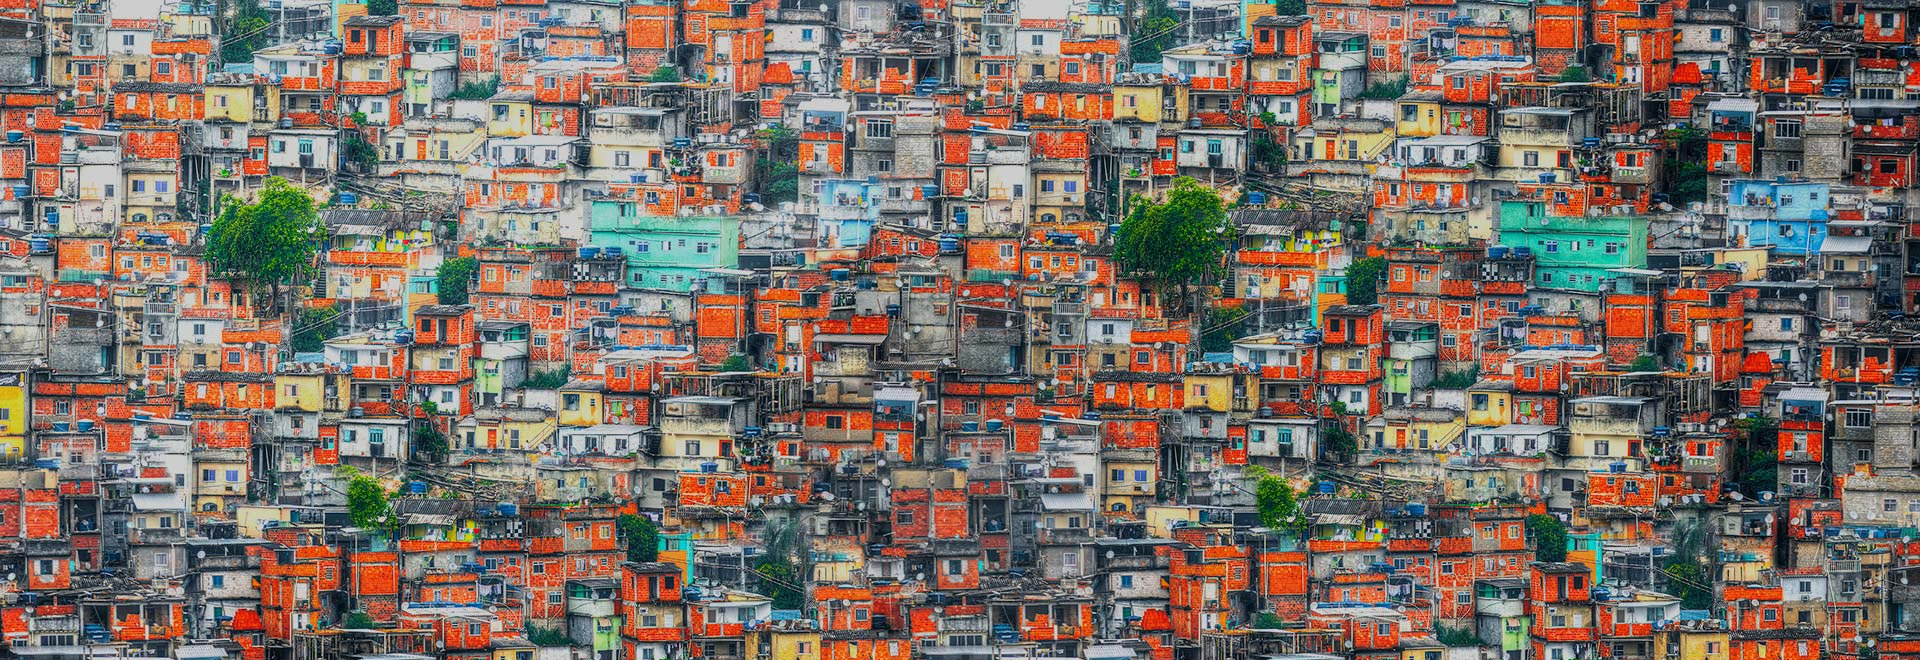 worlds of imagination tropical ghetto dangerous paradise